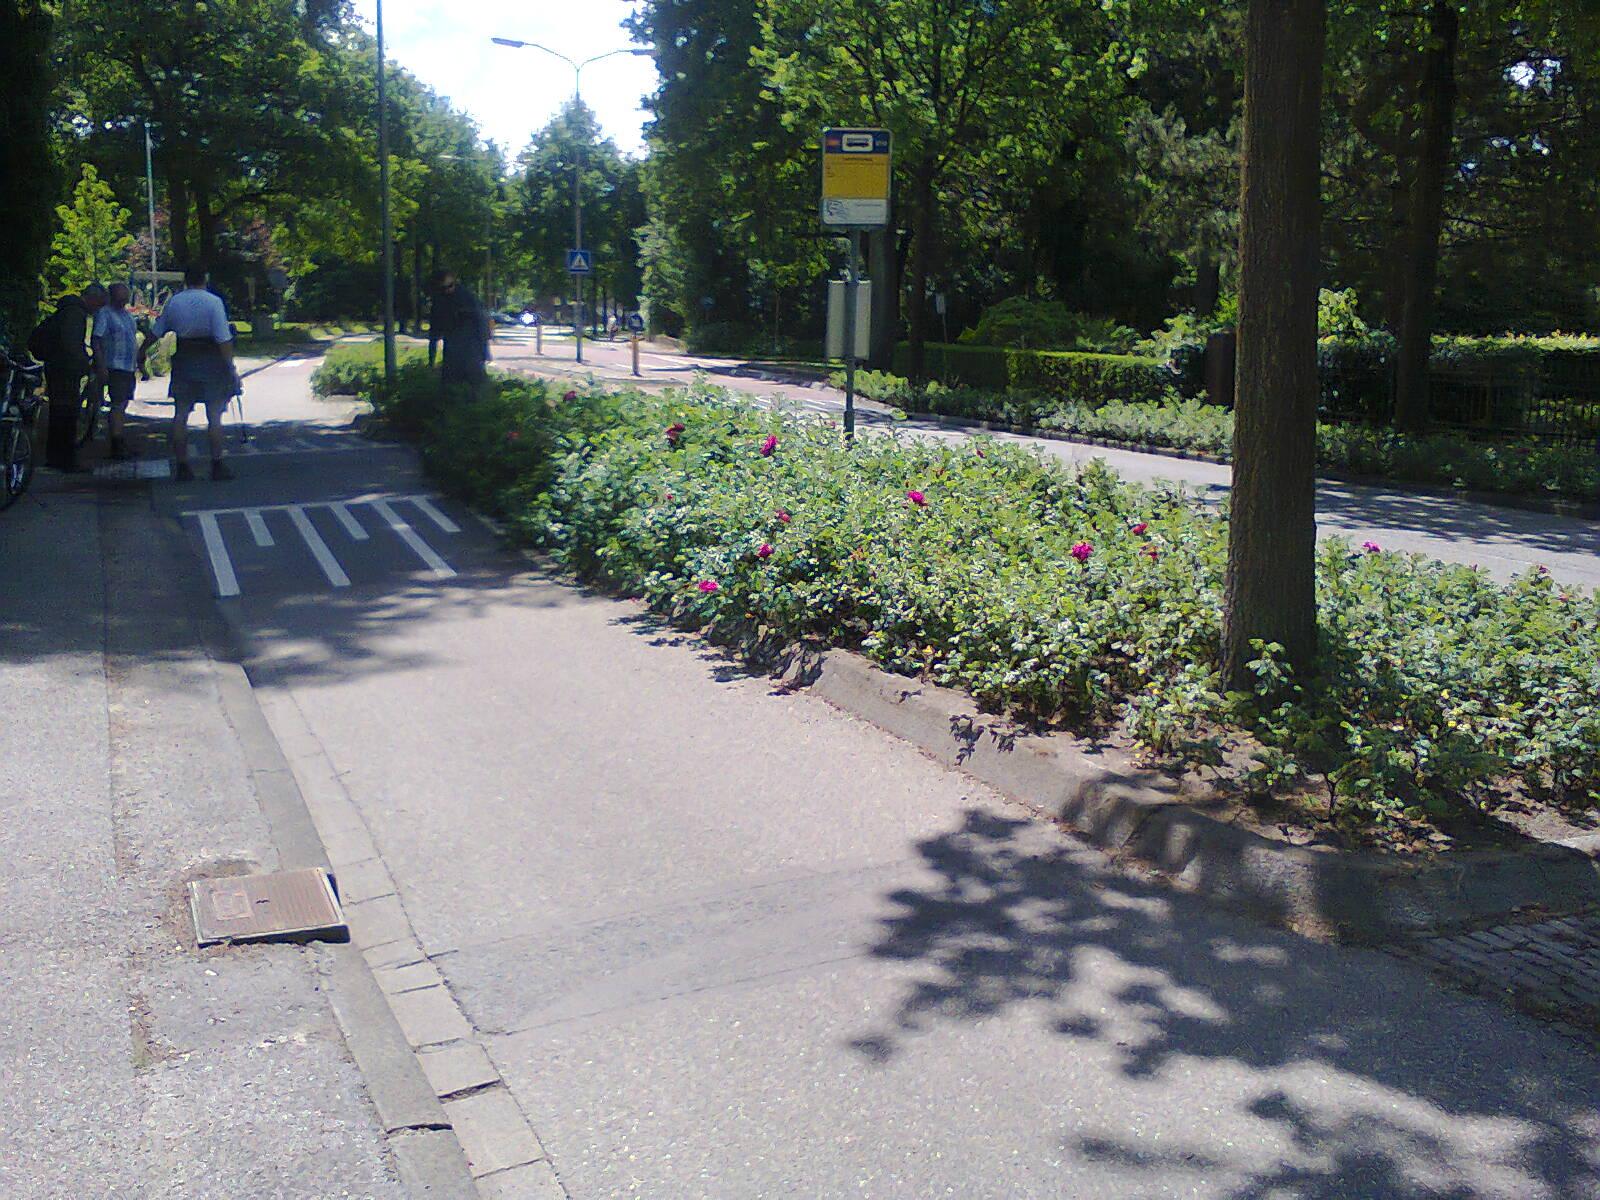 Island bus stop